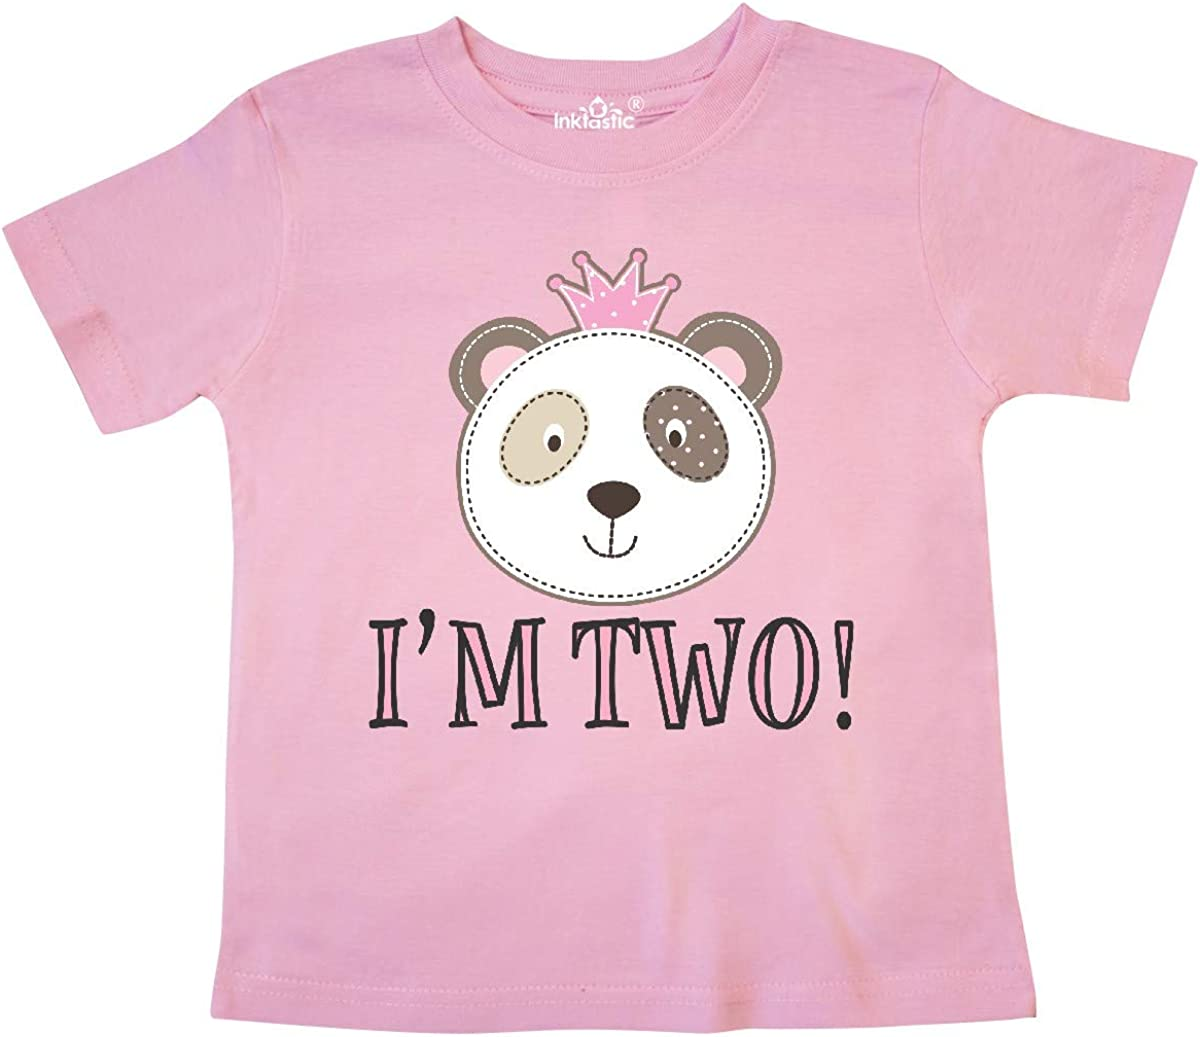 inktastic 2nd Birthday Panda 2 Year Old Girl Toddler T-Shirt